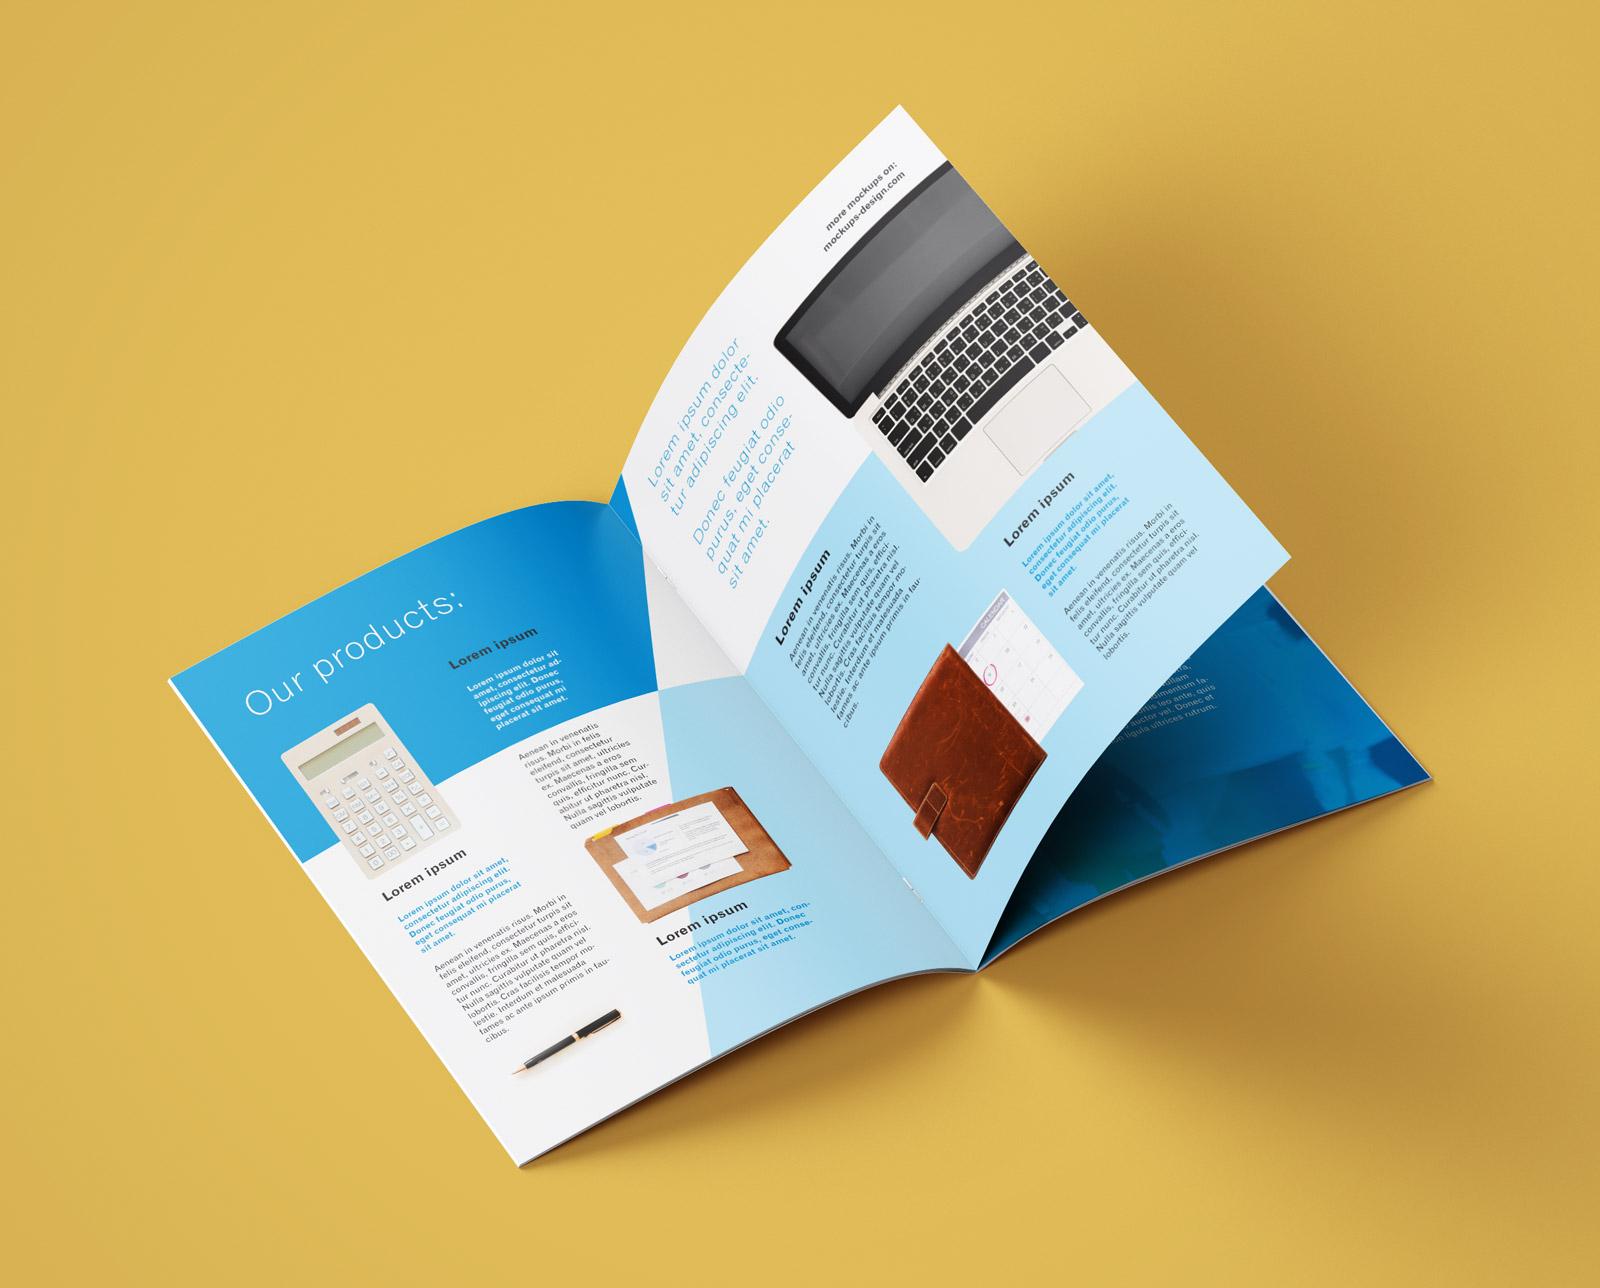 Free A4 Brochure Company Profile Mockup PSD (7)